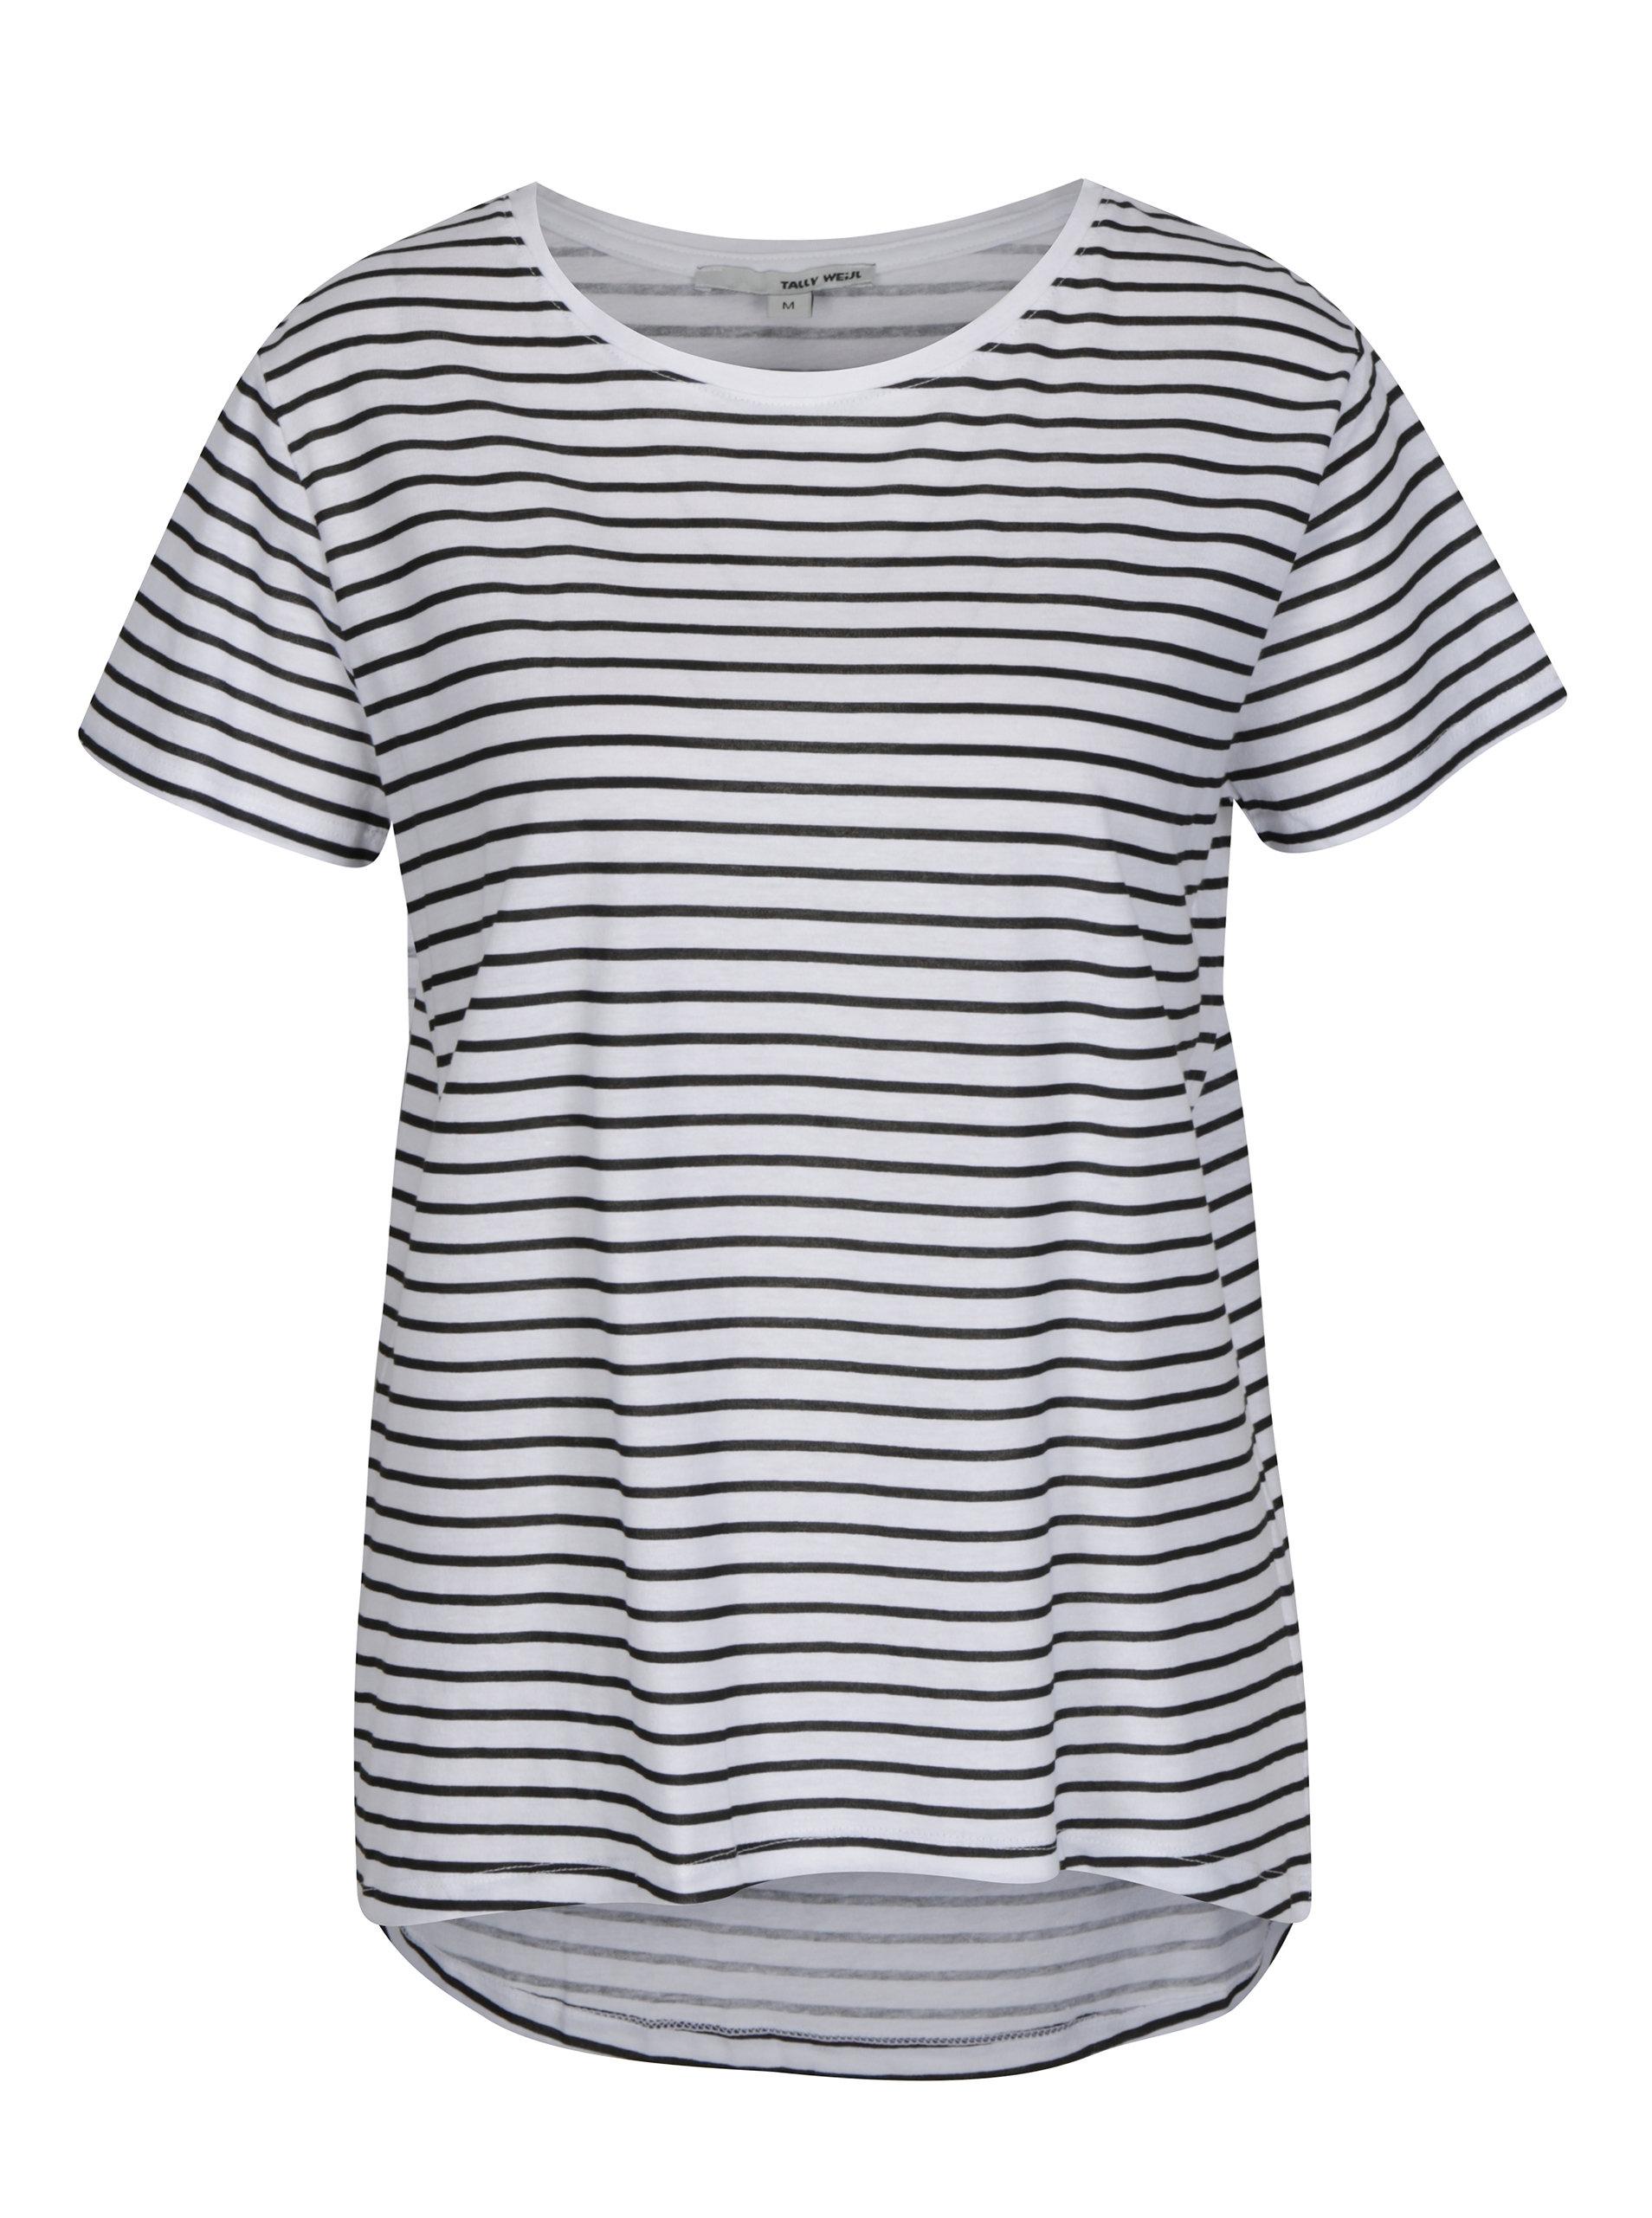 c6aa0cab2d Čierno-biele pruhované tričko TALLY WEiJL ...